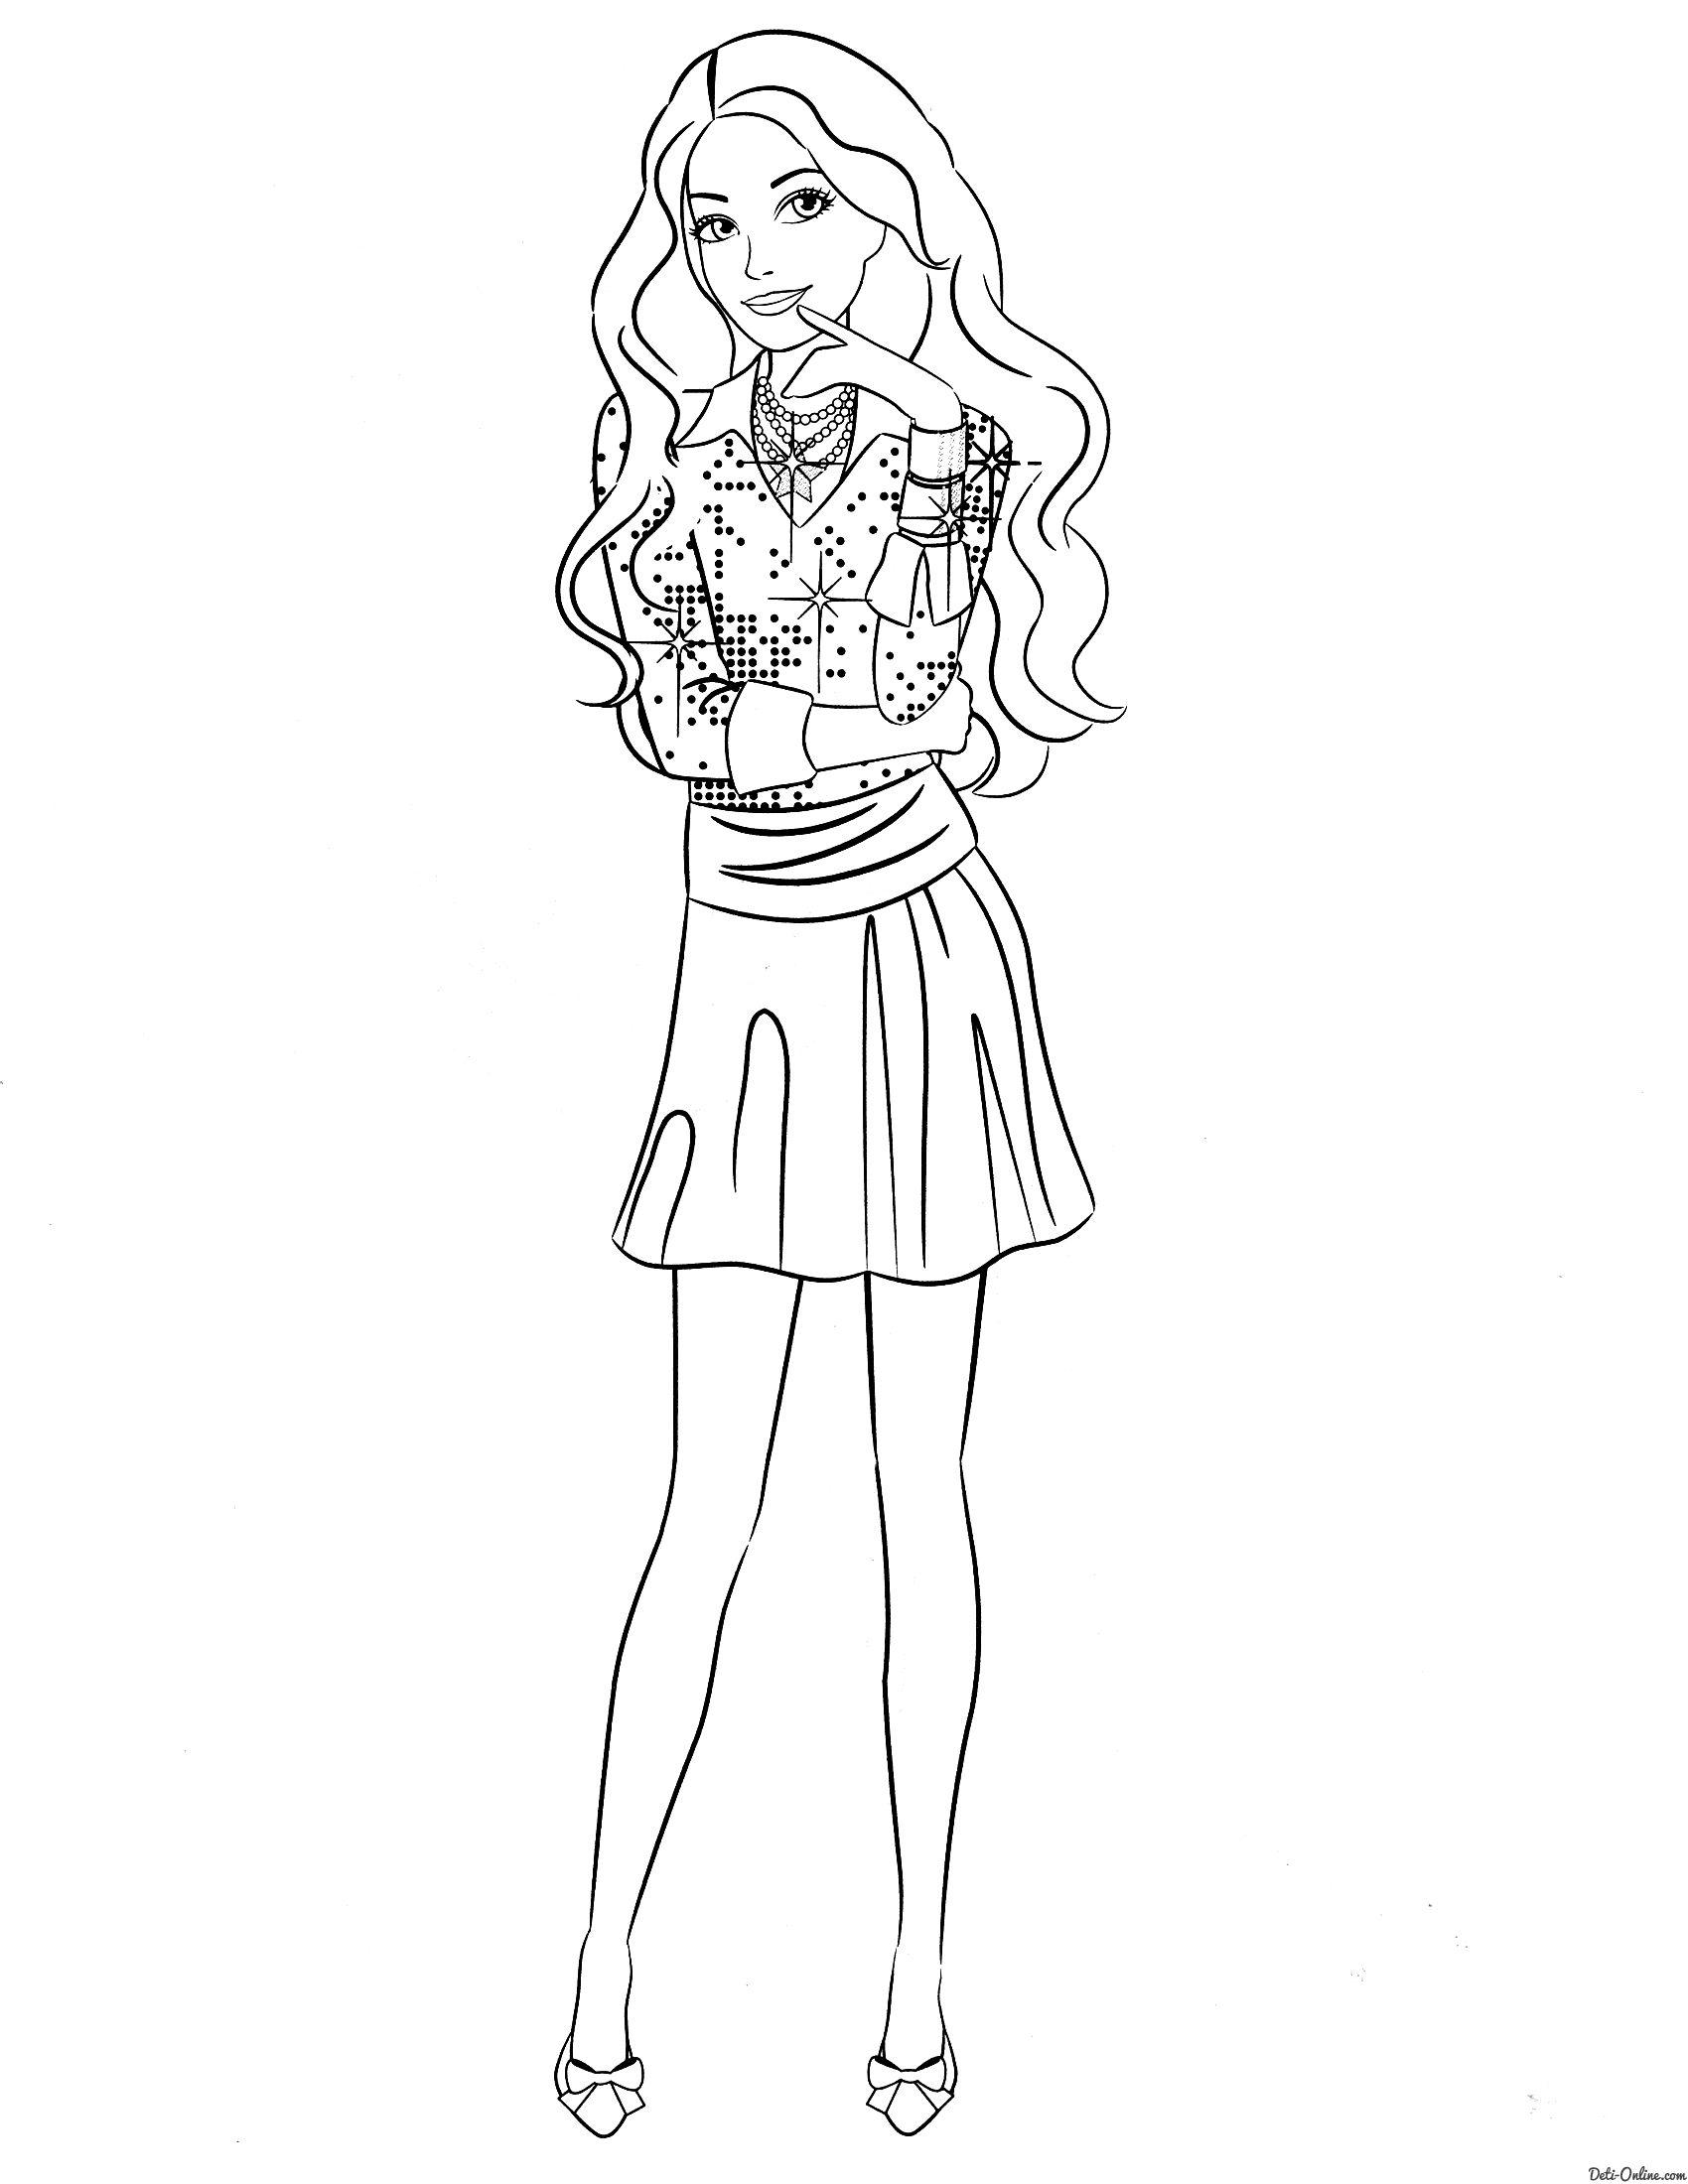 Раскраска Задумчивая Барби | Ausmalbilder Barbie | Pinterest ...